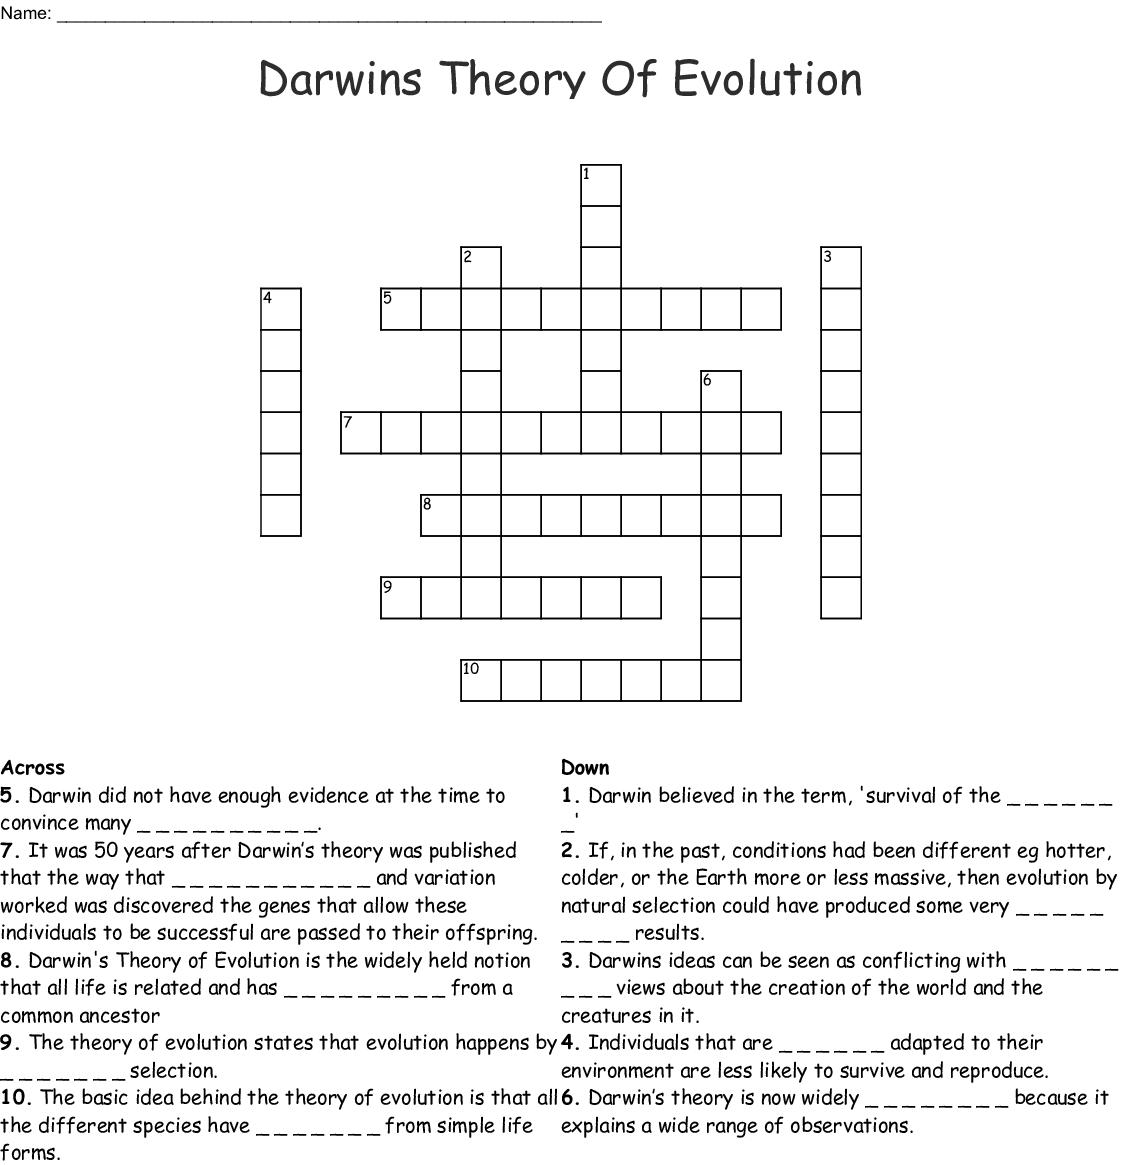 Darwins Theory Of Evolution Crossword